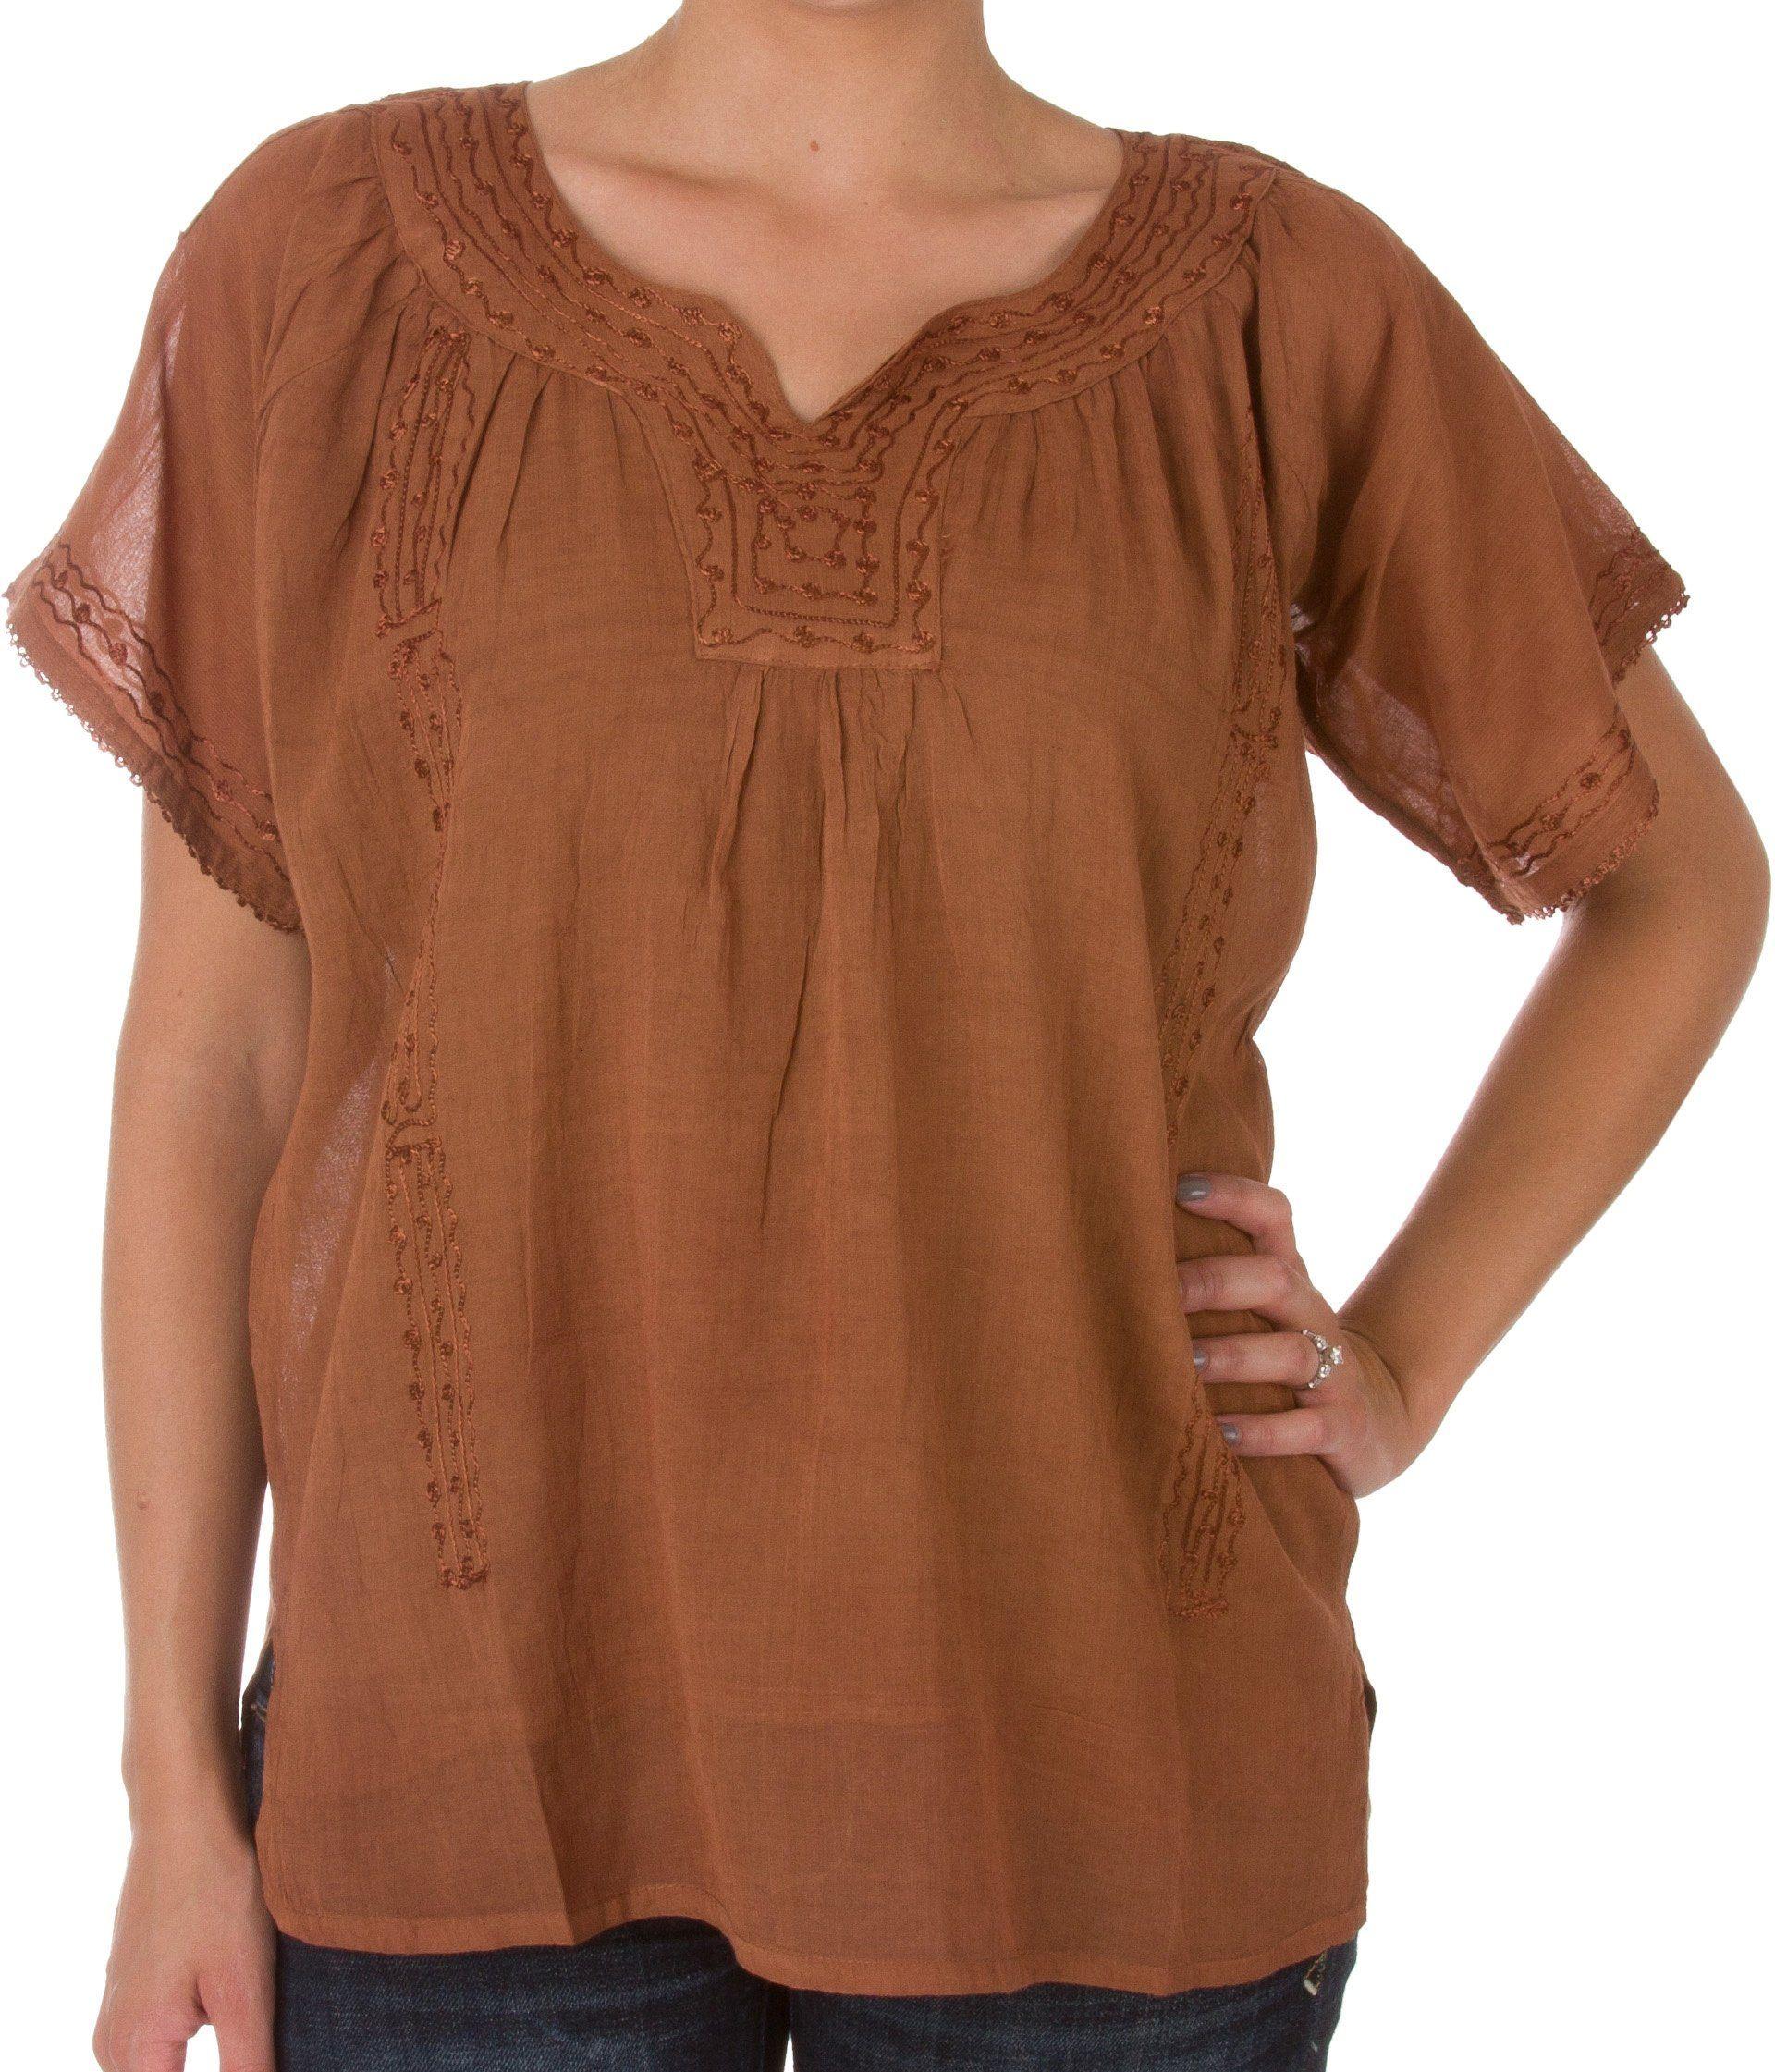 Sakkas Embroidered 100% Cotton Semi-Sheer Short Sleeve